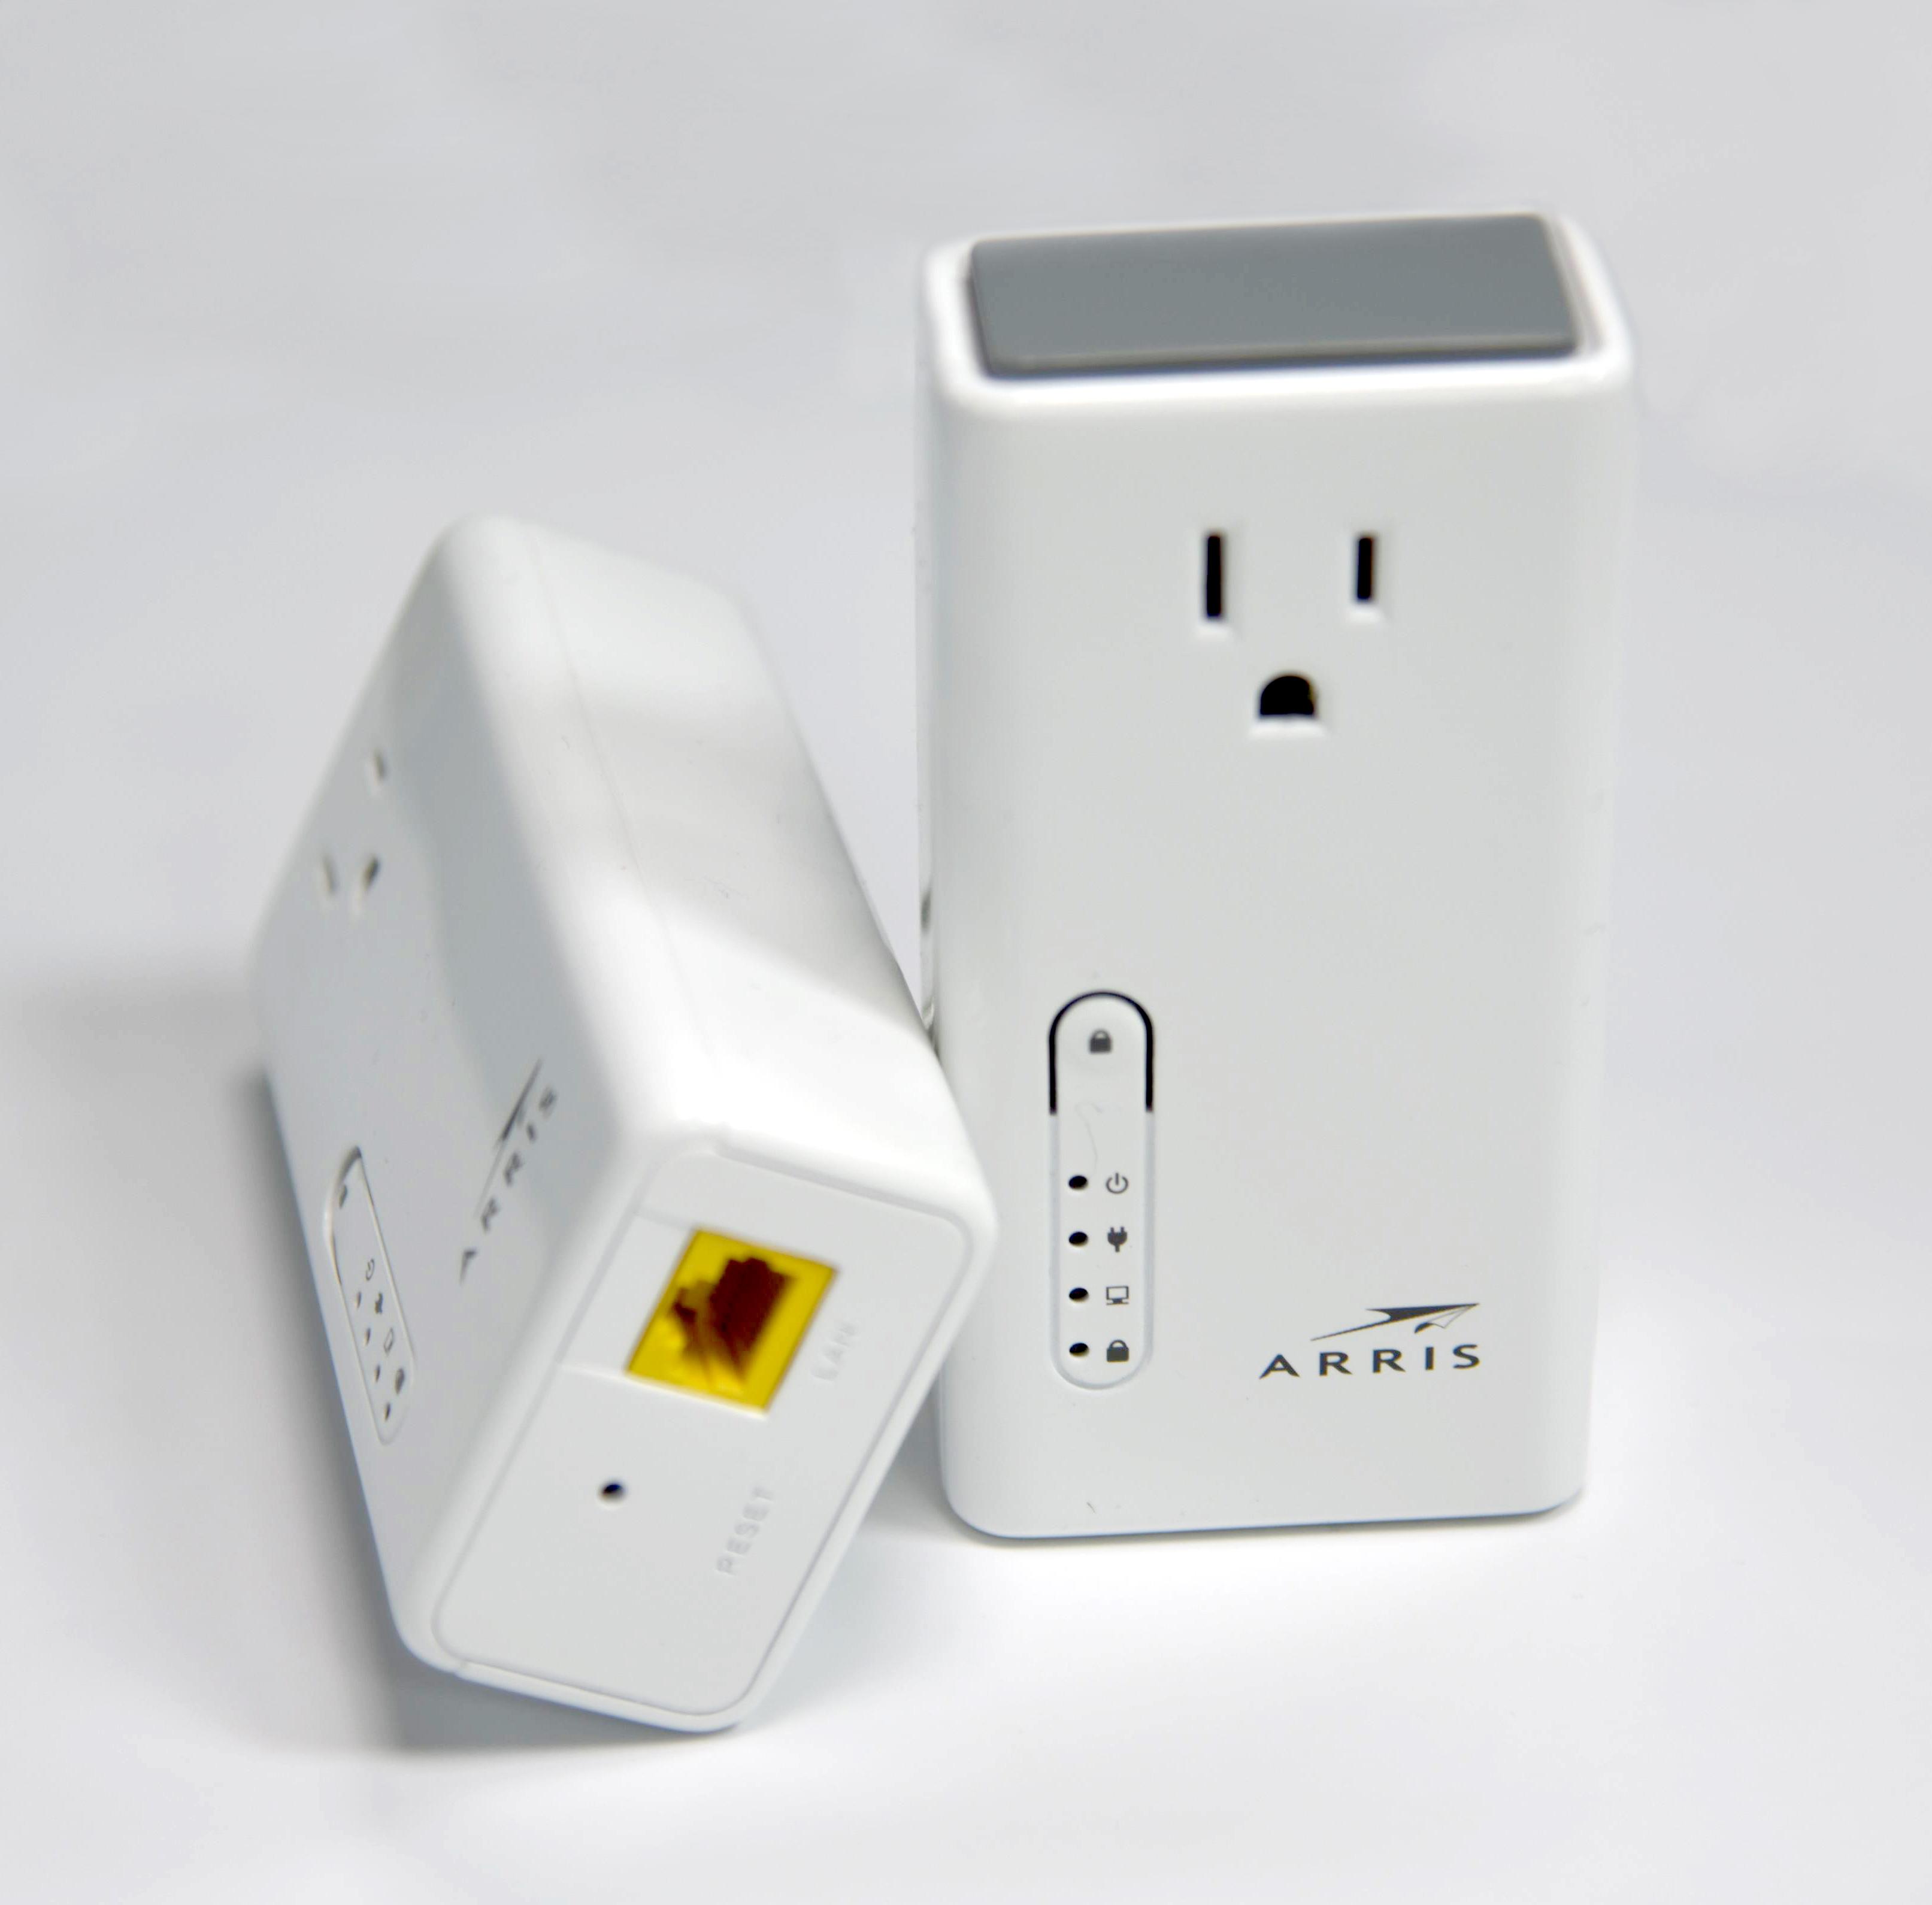 ARRIS Solutions: GPE2001